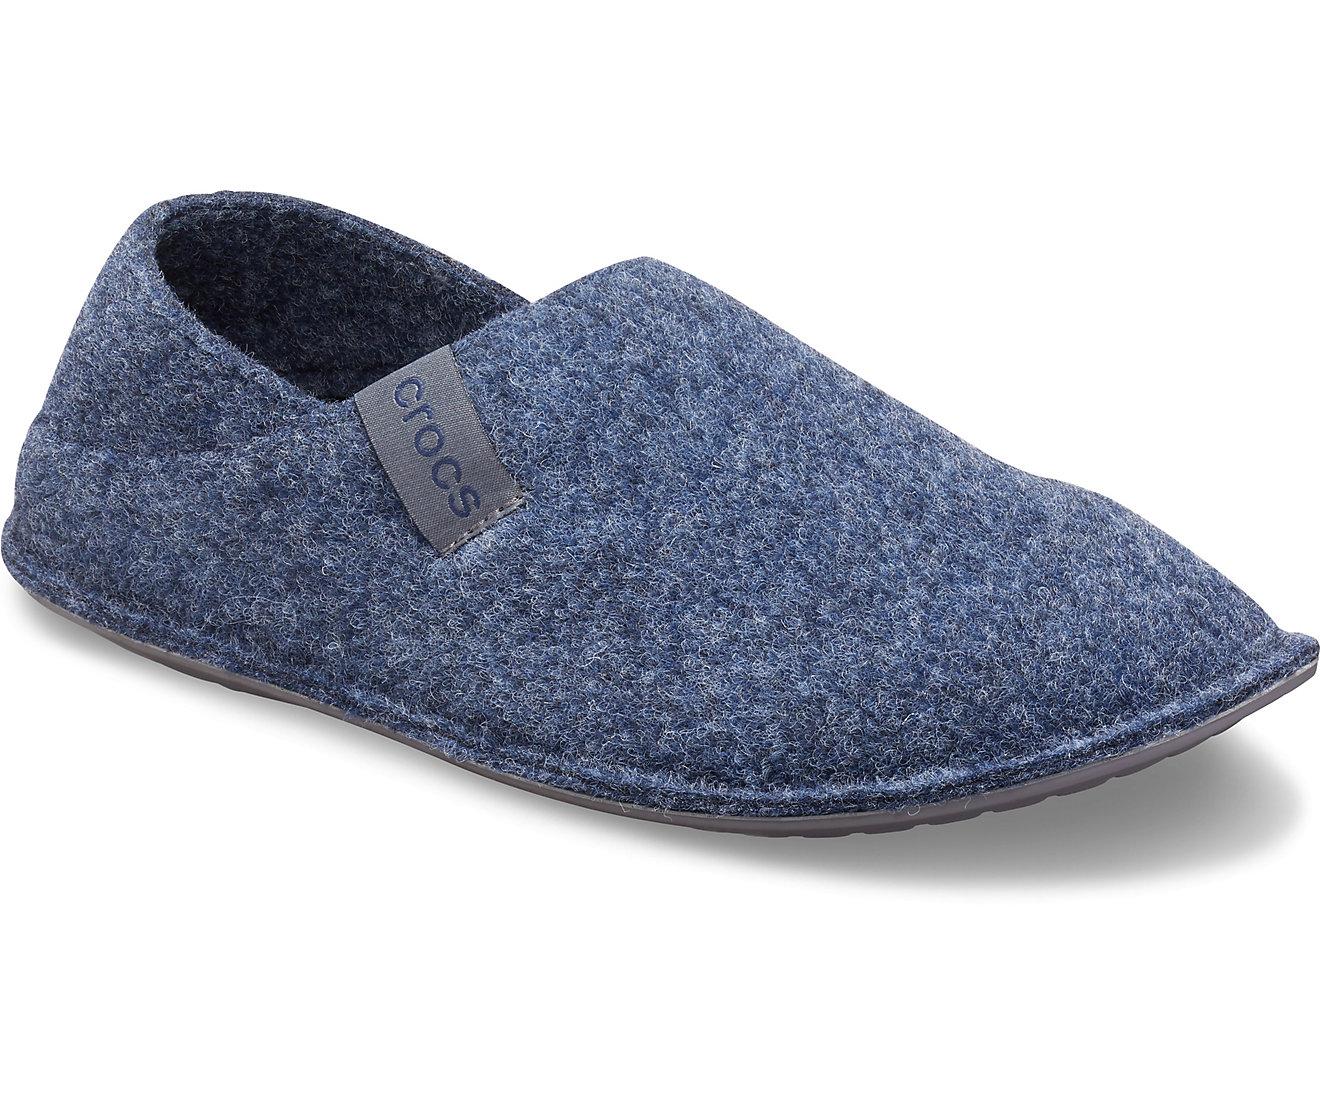 Crocs Classic Convertible Slipper 205837-459 NAVY/CHARCOAL Μπλε σκούρο